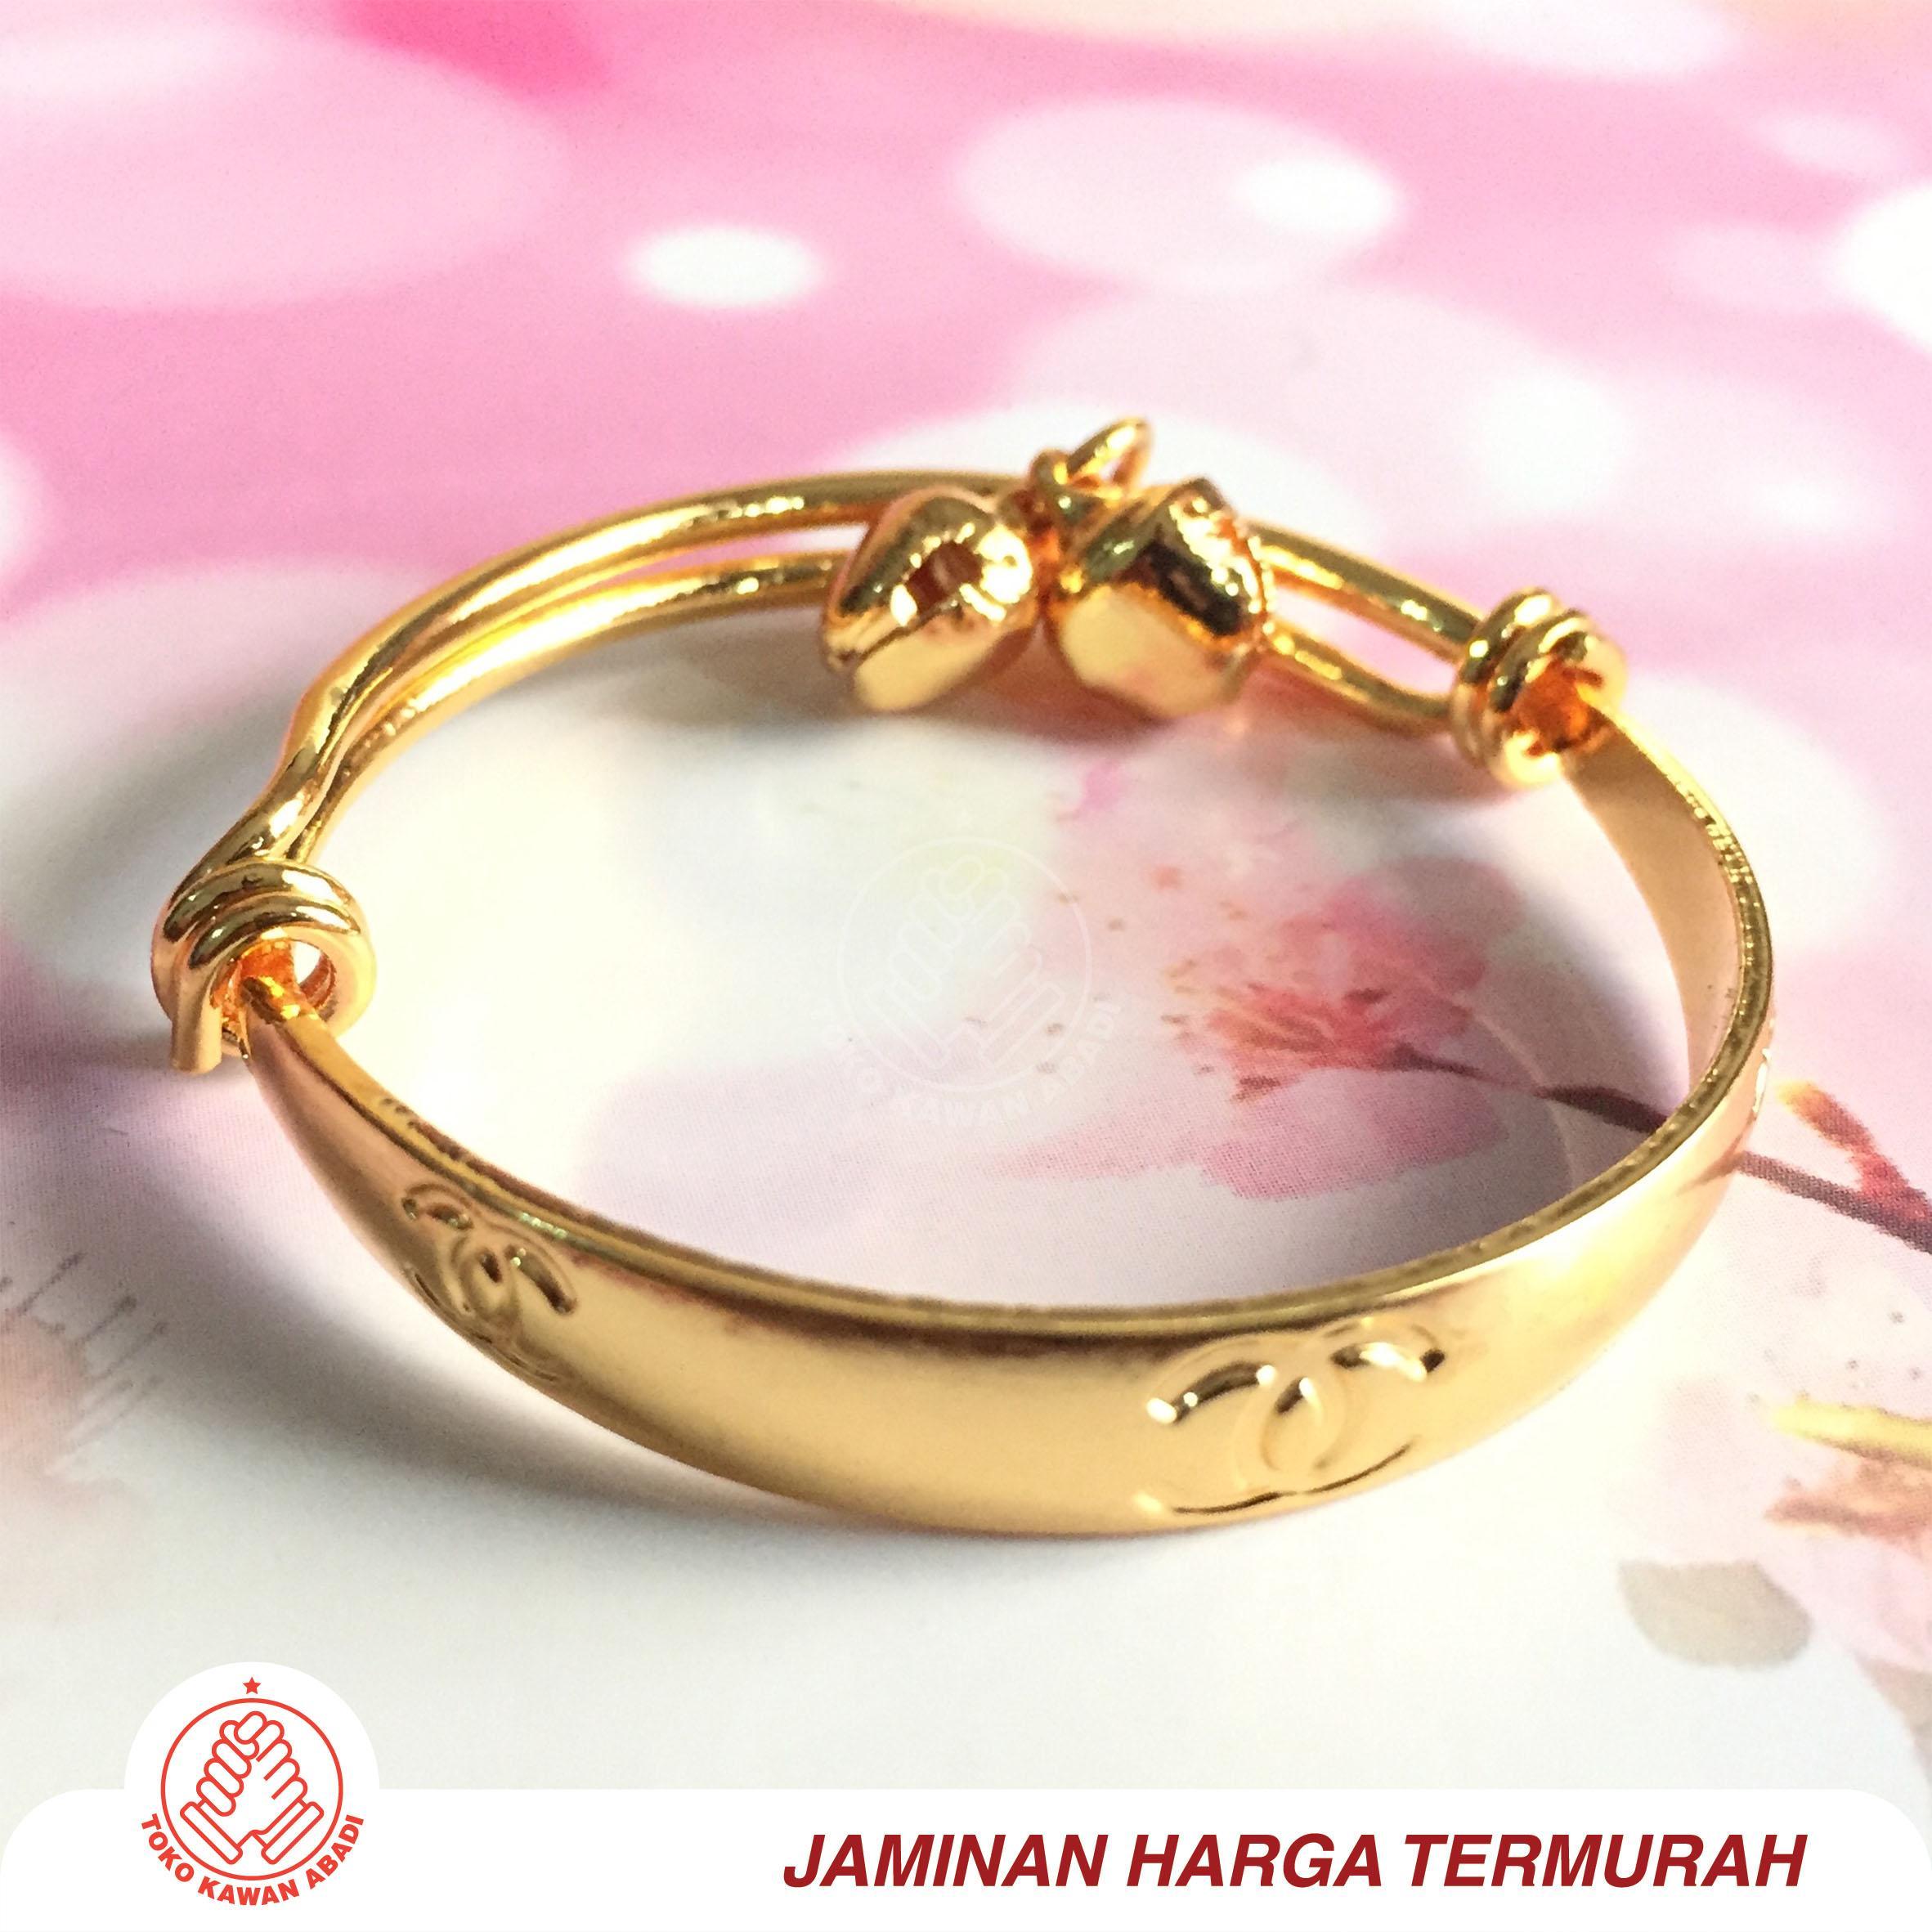 Gelang Tangan Xuping Gold Anak Bayi Perempuan *01 By Toko Kawan Abadi.